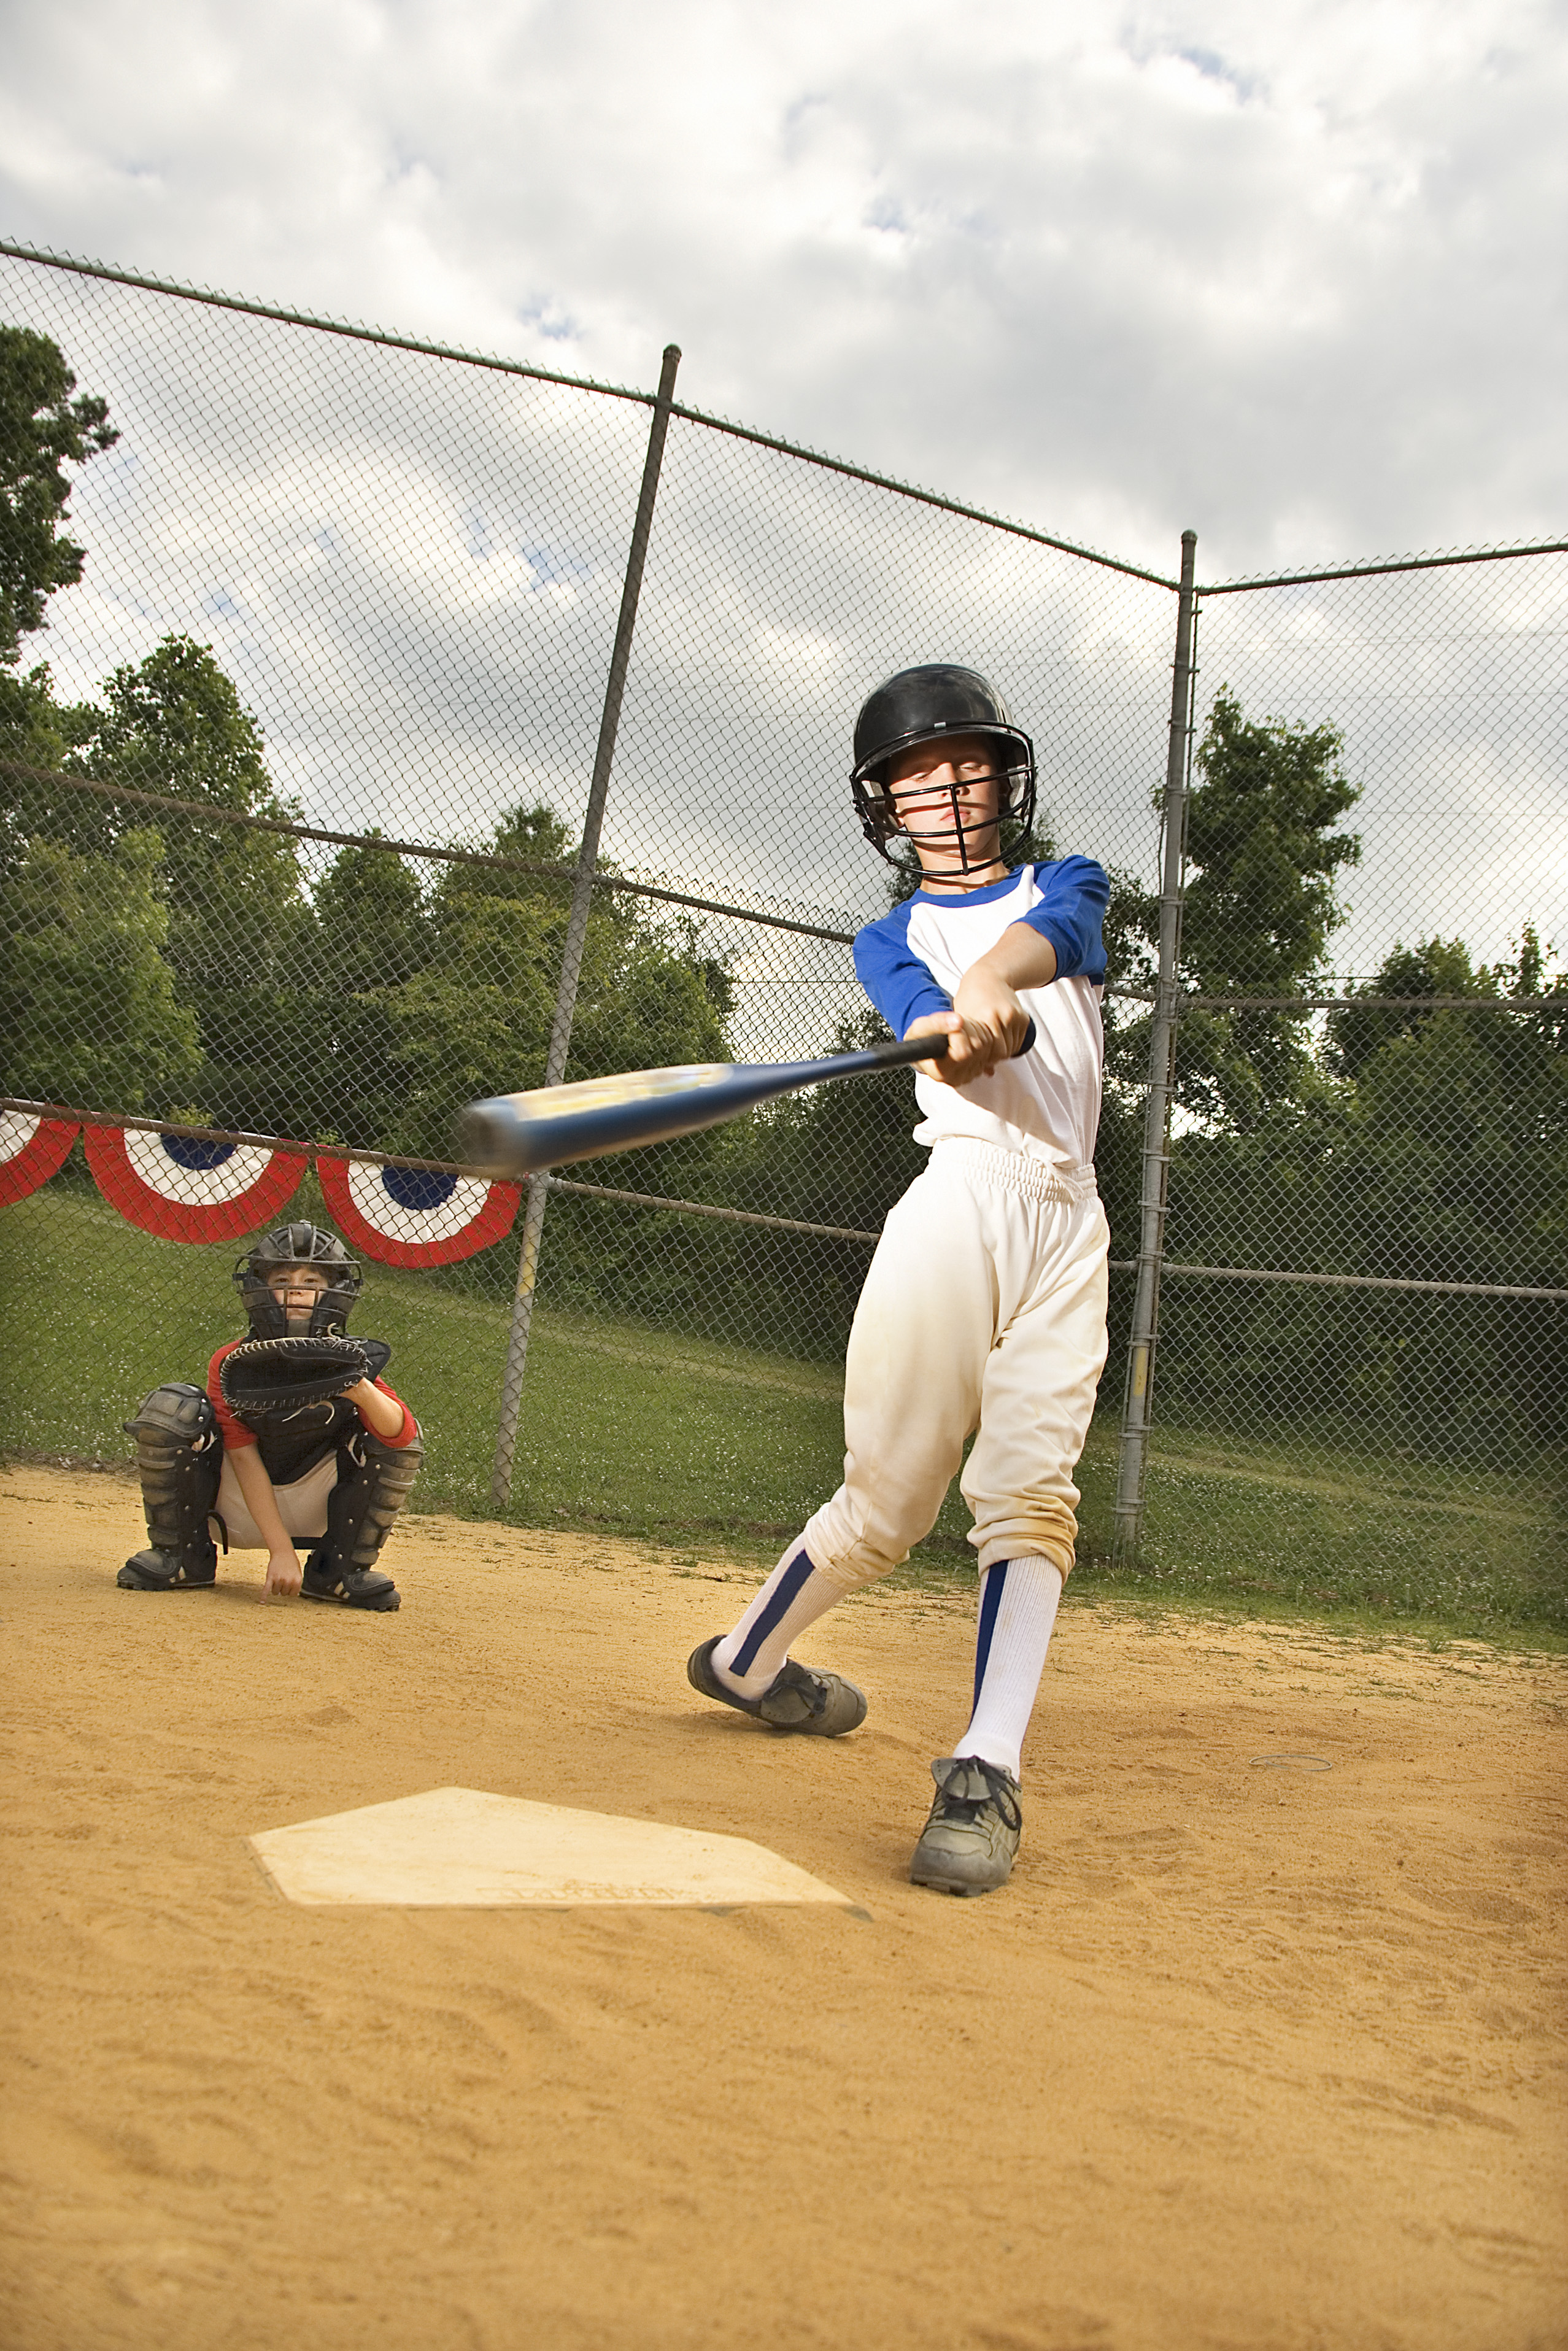 Softball Bat Care